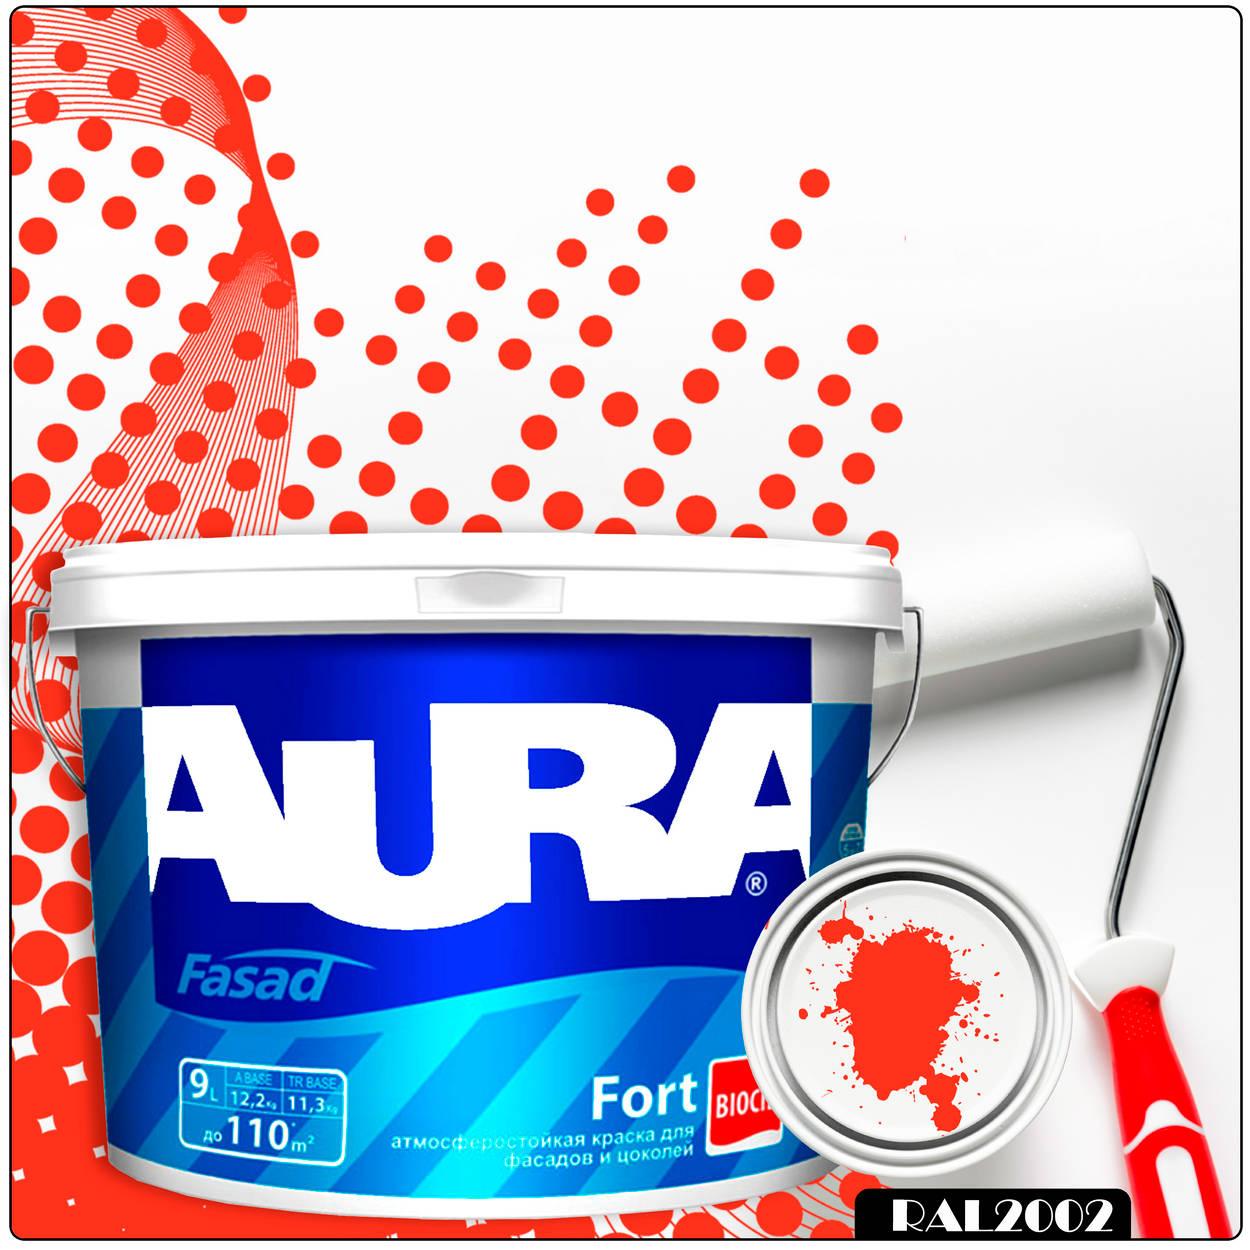 Фото 3 - Краска Aura Fasad Fort, RAL 2002 Алый, латексная, матовая, для фасада и цоколей, 9л, Аура.